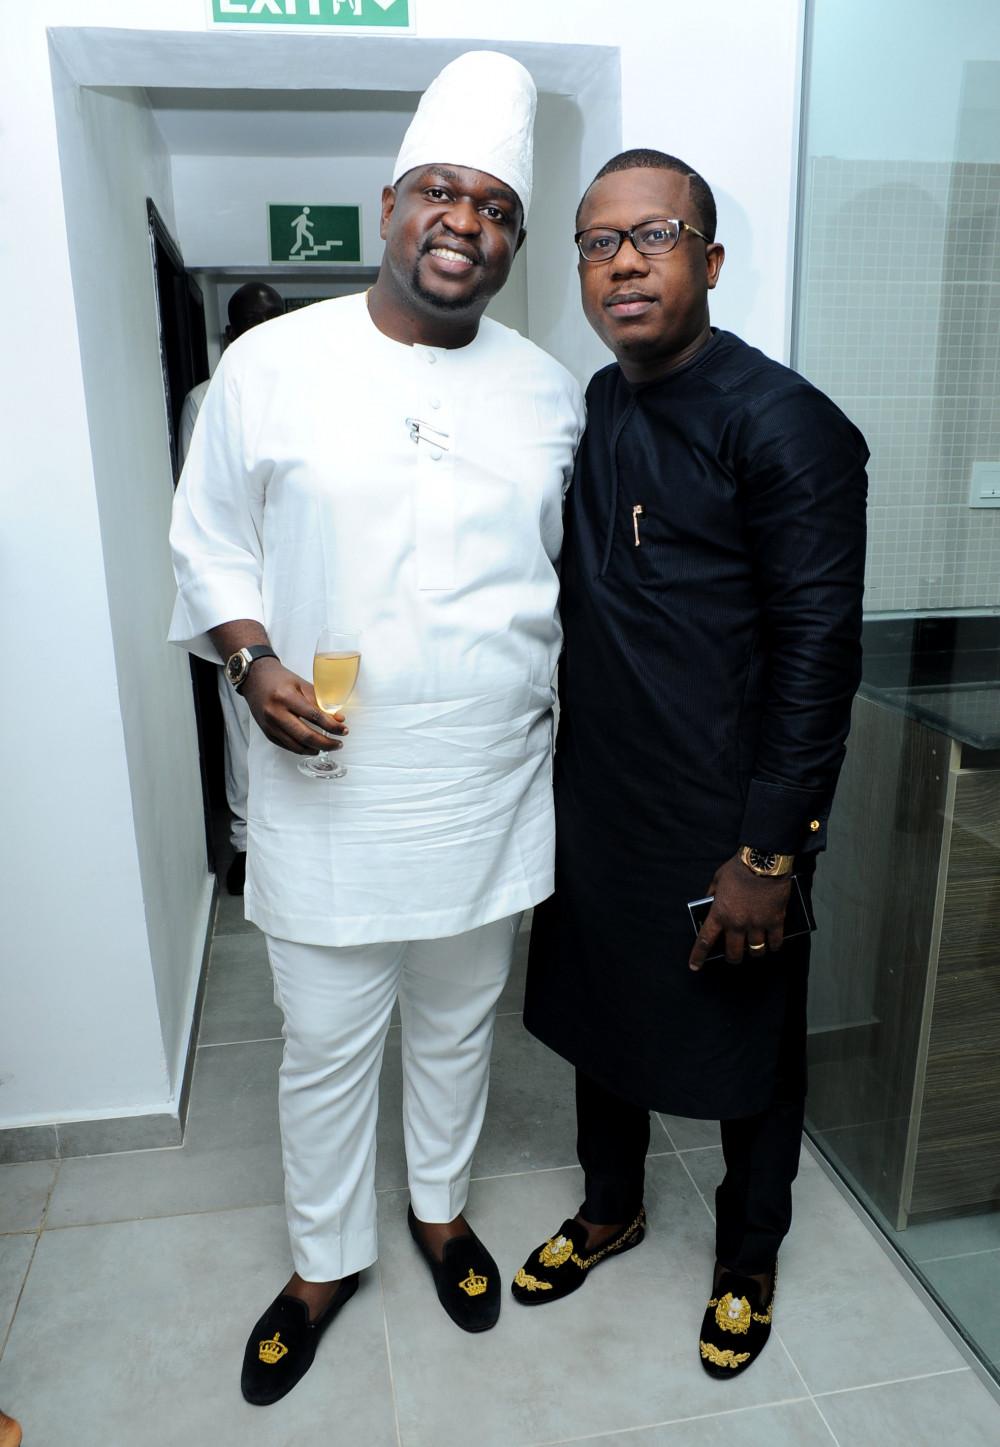 Kayode Adegbola and Folajimi Lai-Mohammed